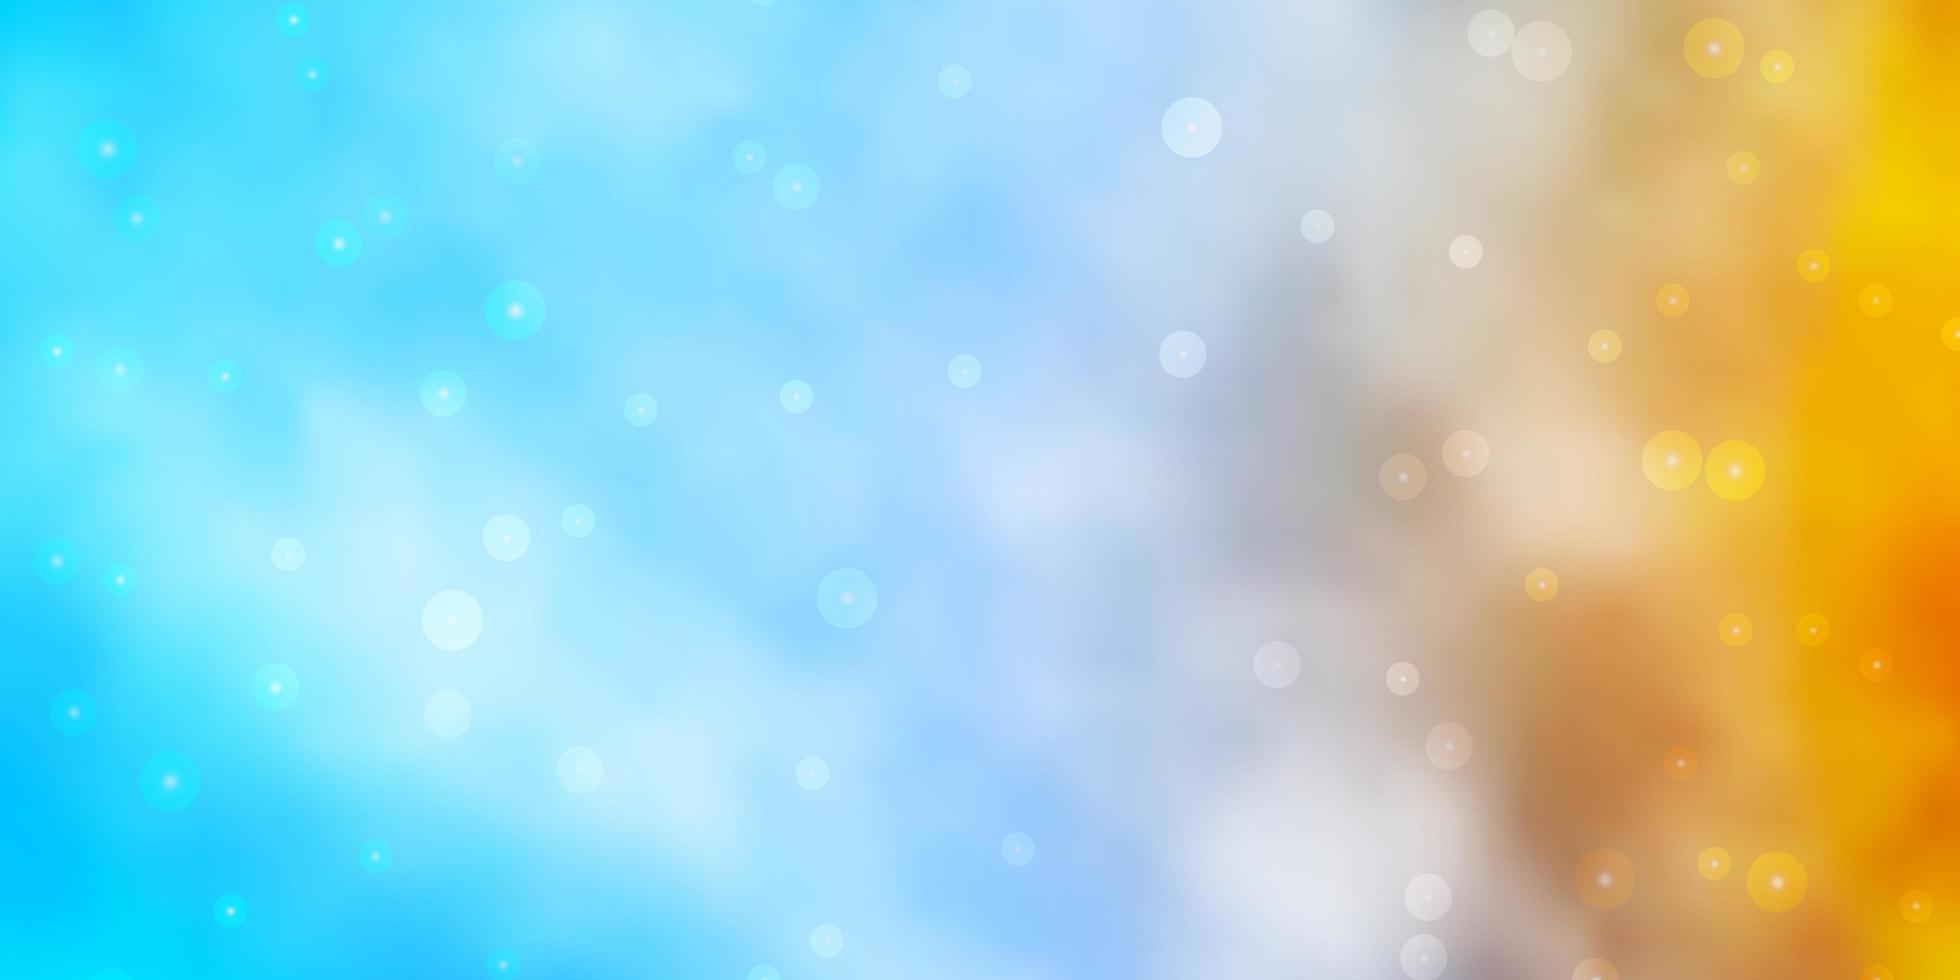 fundo vector azul claro, amarelo com estrelas pequenas e grandes.